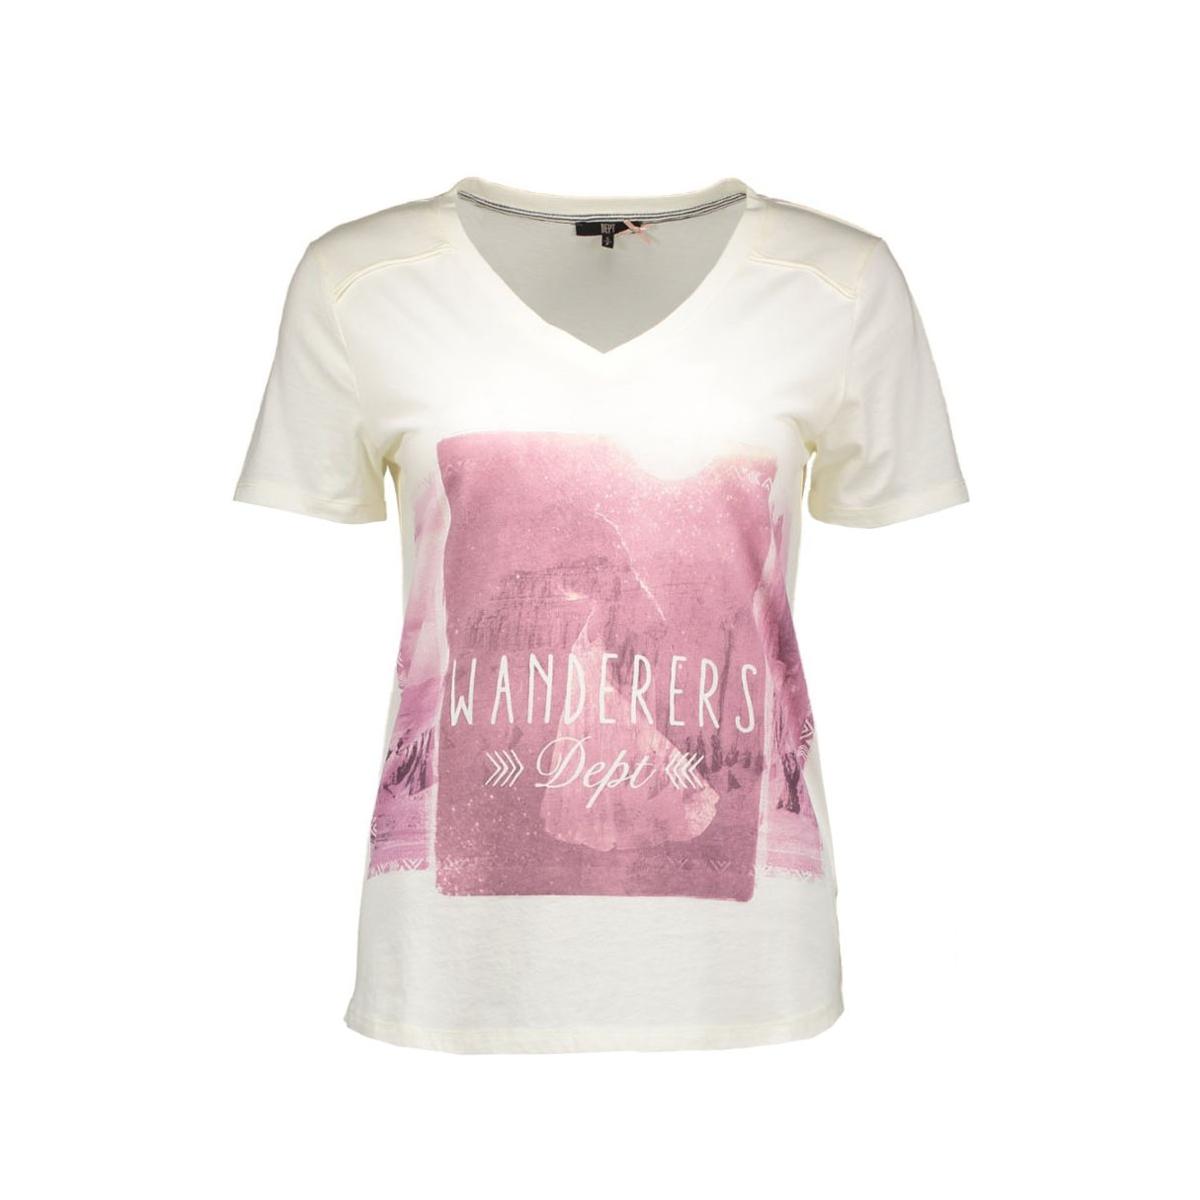 31101008 dept t-shirt 10060 ivory